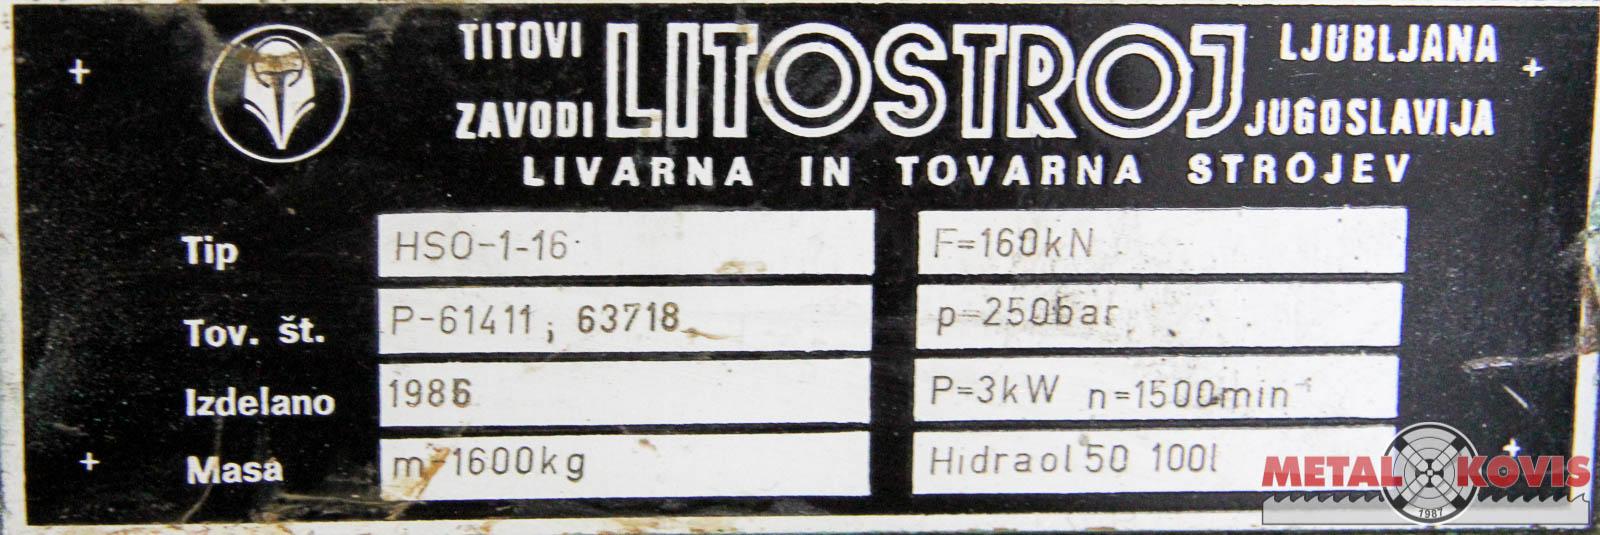 Hidraulična preša Litostroj HSO-1-16, 15 t